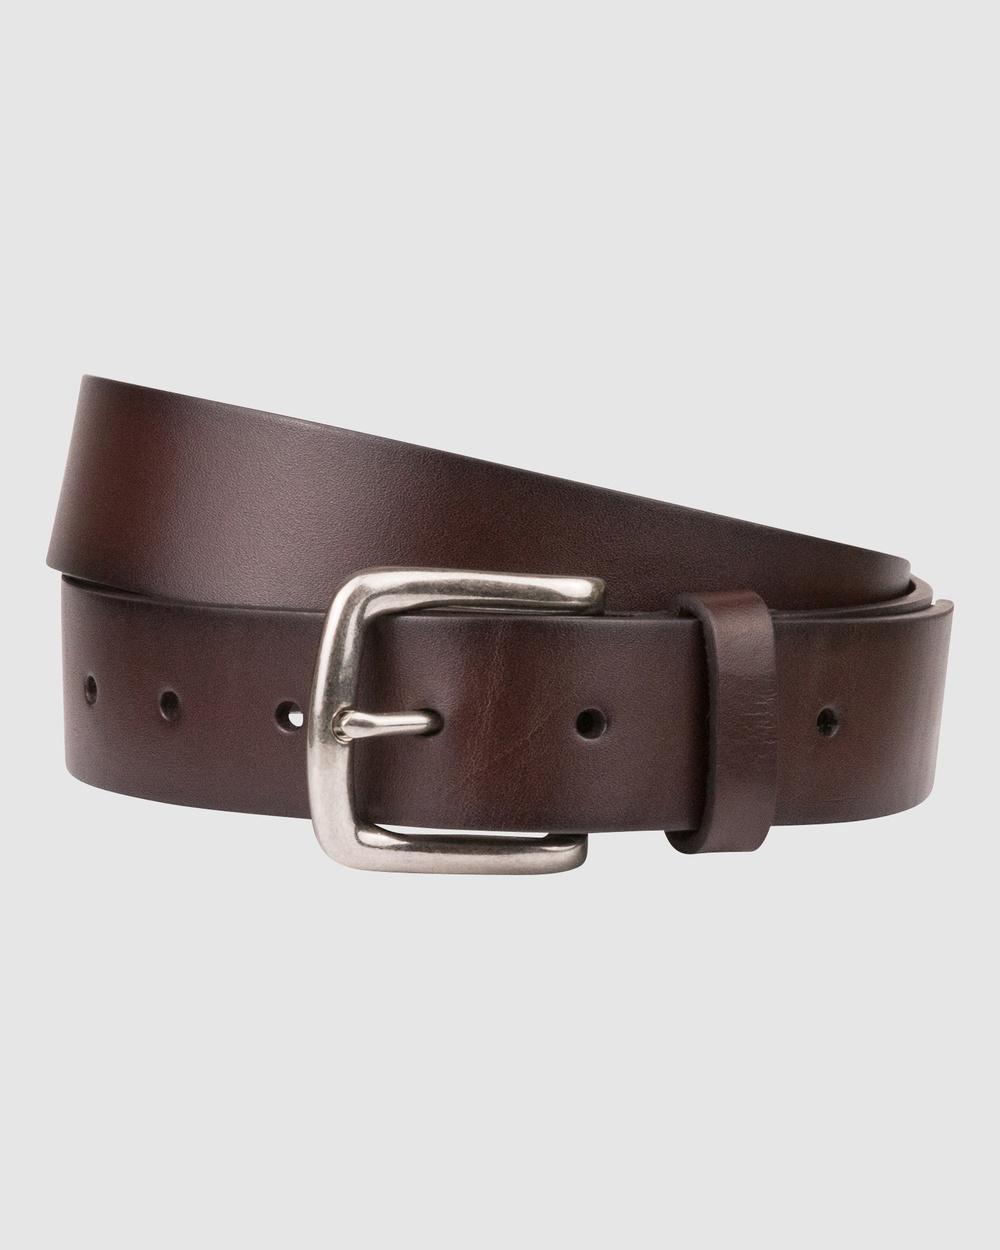 Florsheim Pacino Belt Belts Dark brown